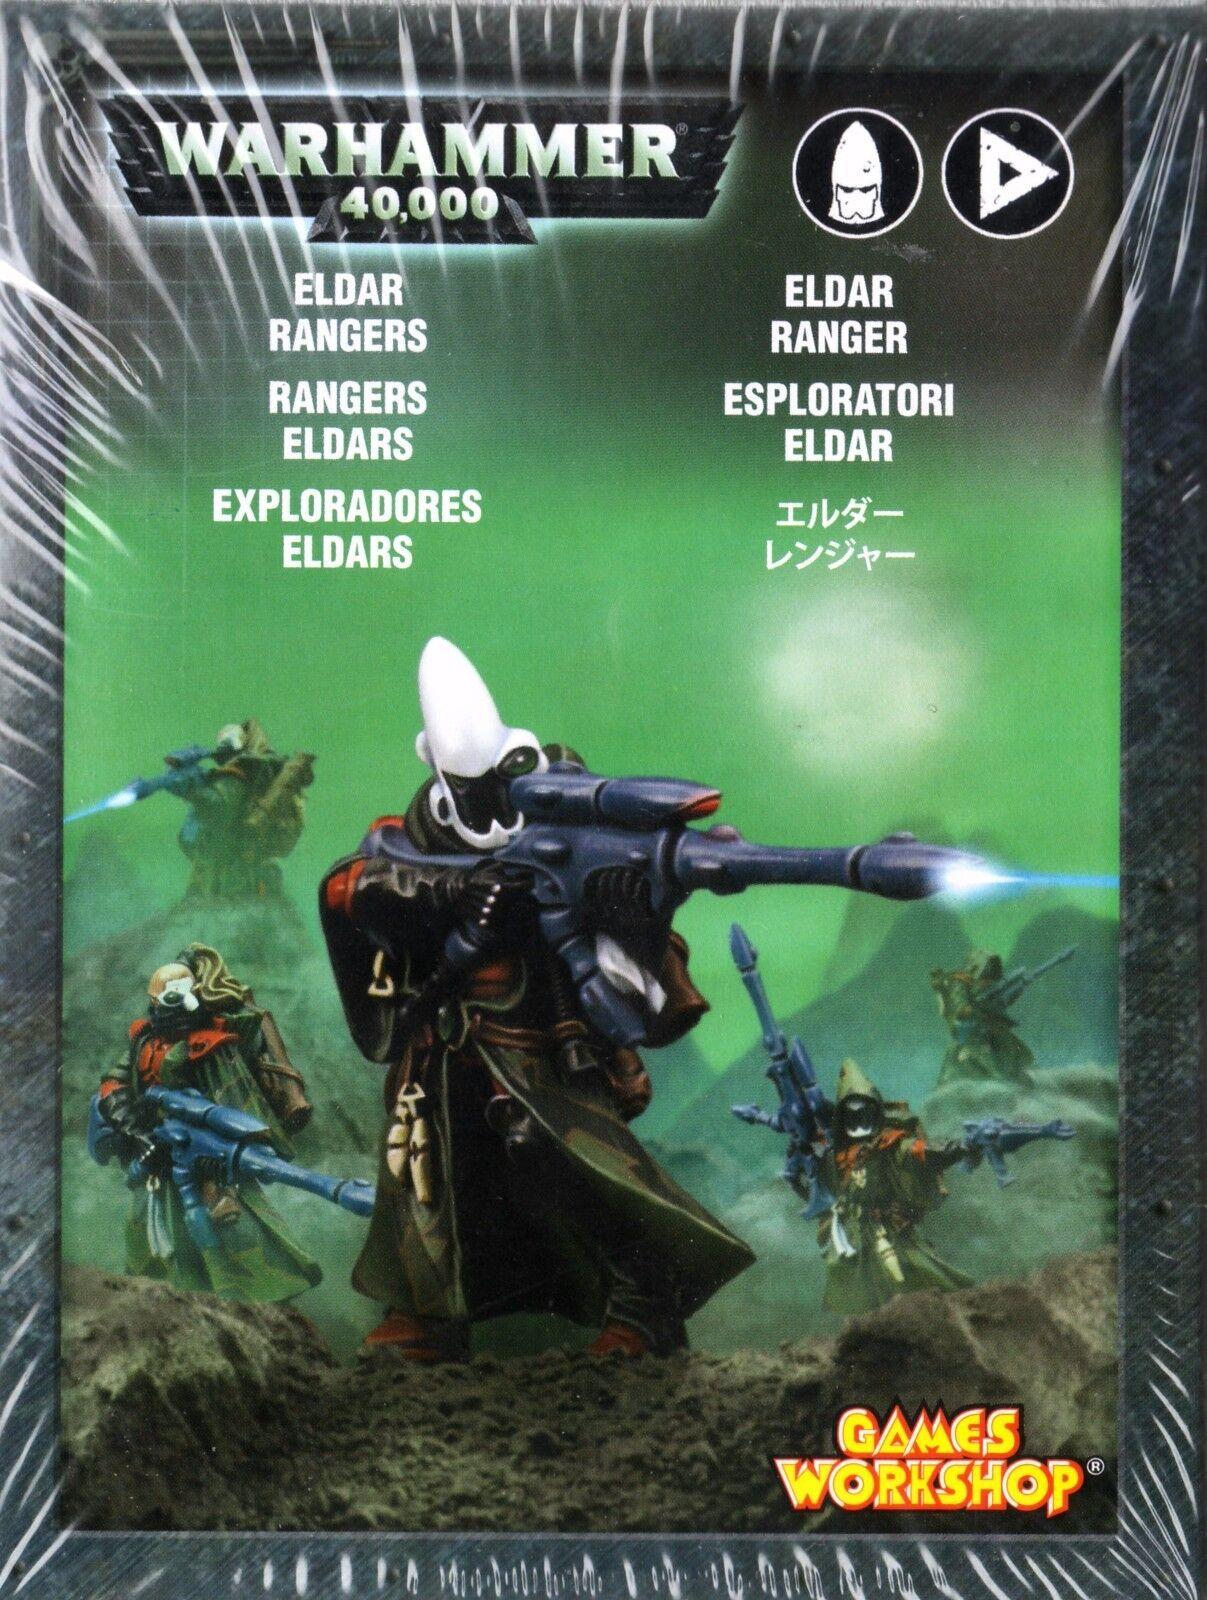 Warhammer 40K Eldar Rangers 46-29 SEALED GW  nuovo  a buon mercato